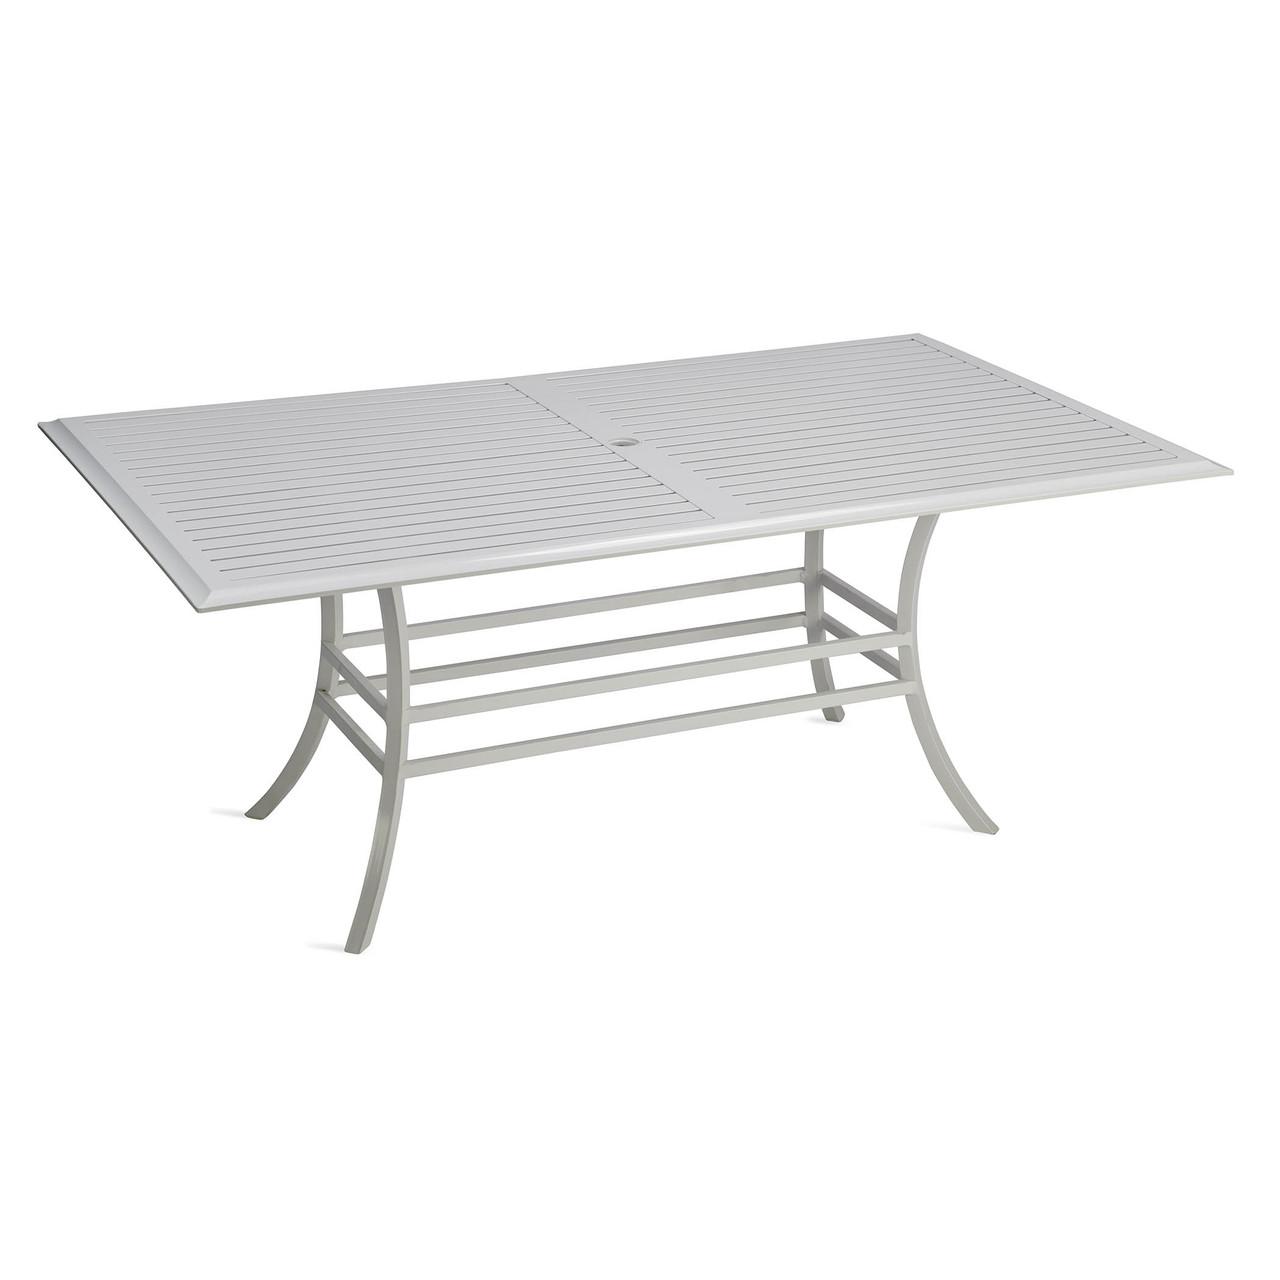 Malibu Outdoor Dining Table